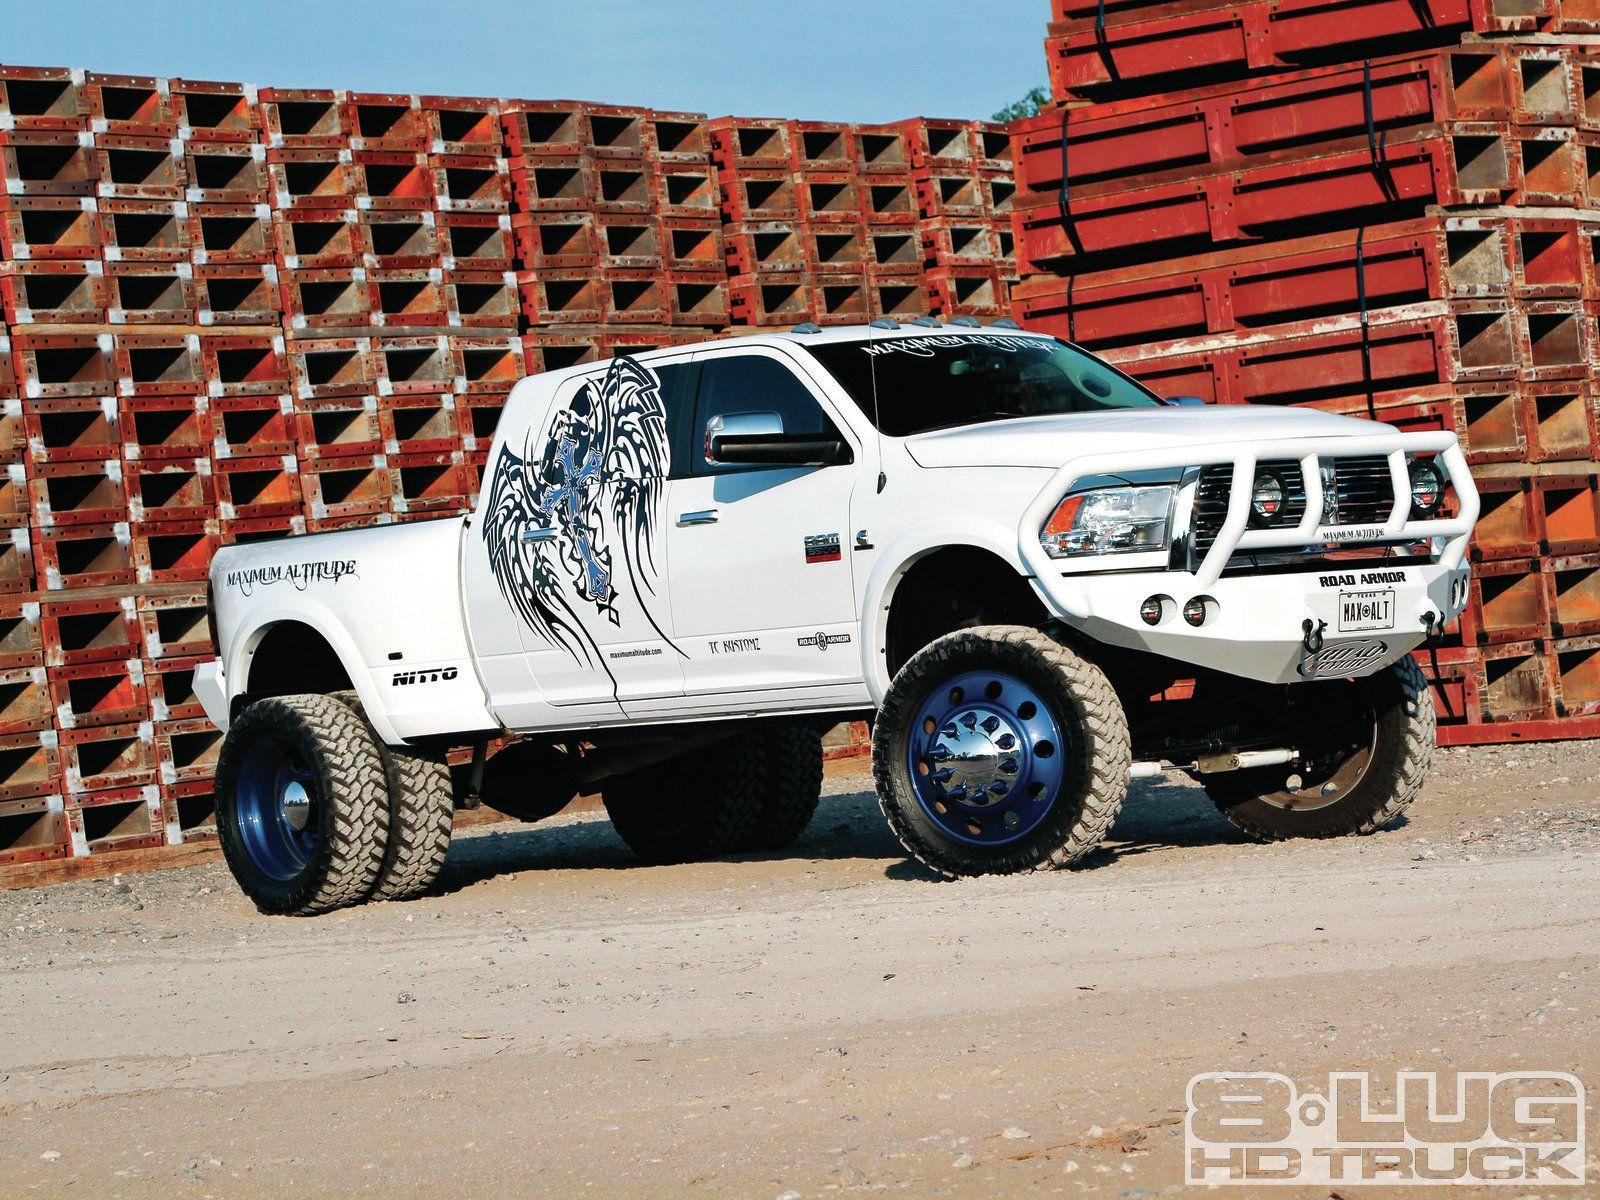 Lifted Dodge Ram Pictures Images Photos On Photobucket Trucks Lifted Trucks Jacked Up Trucks